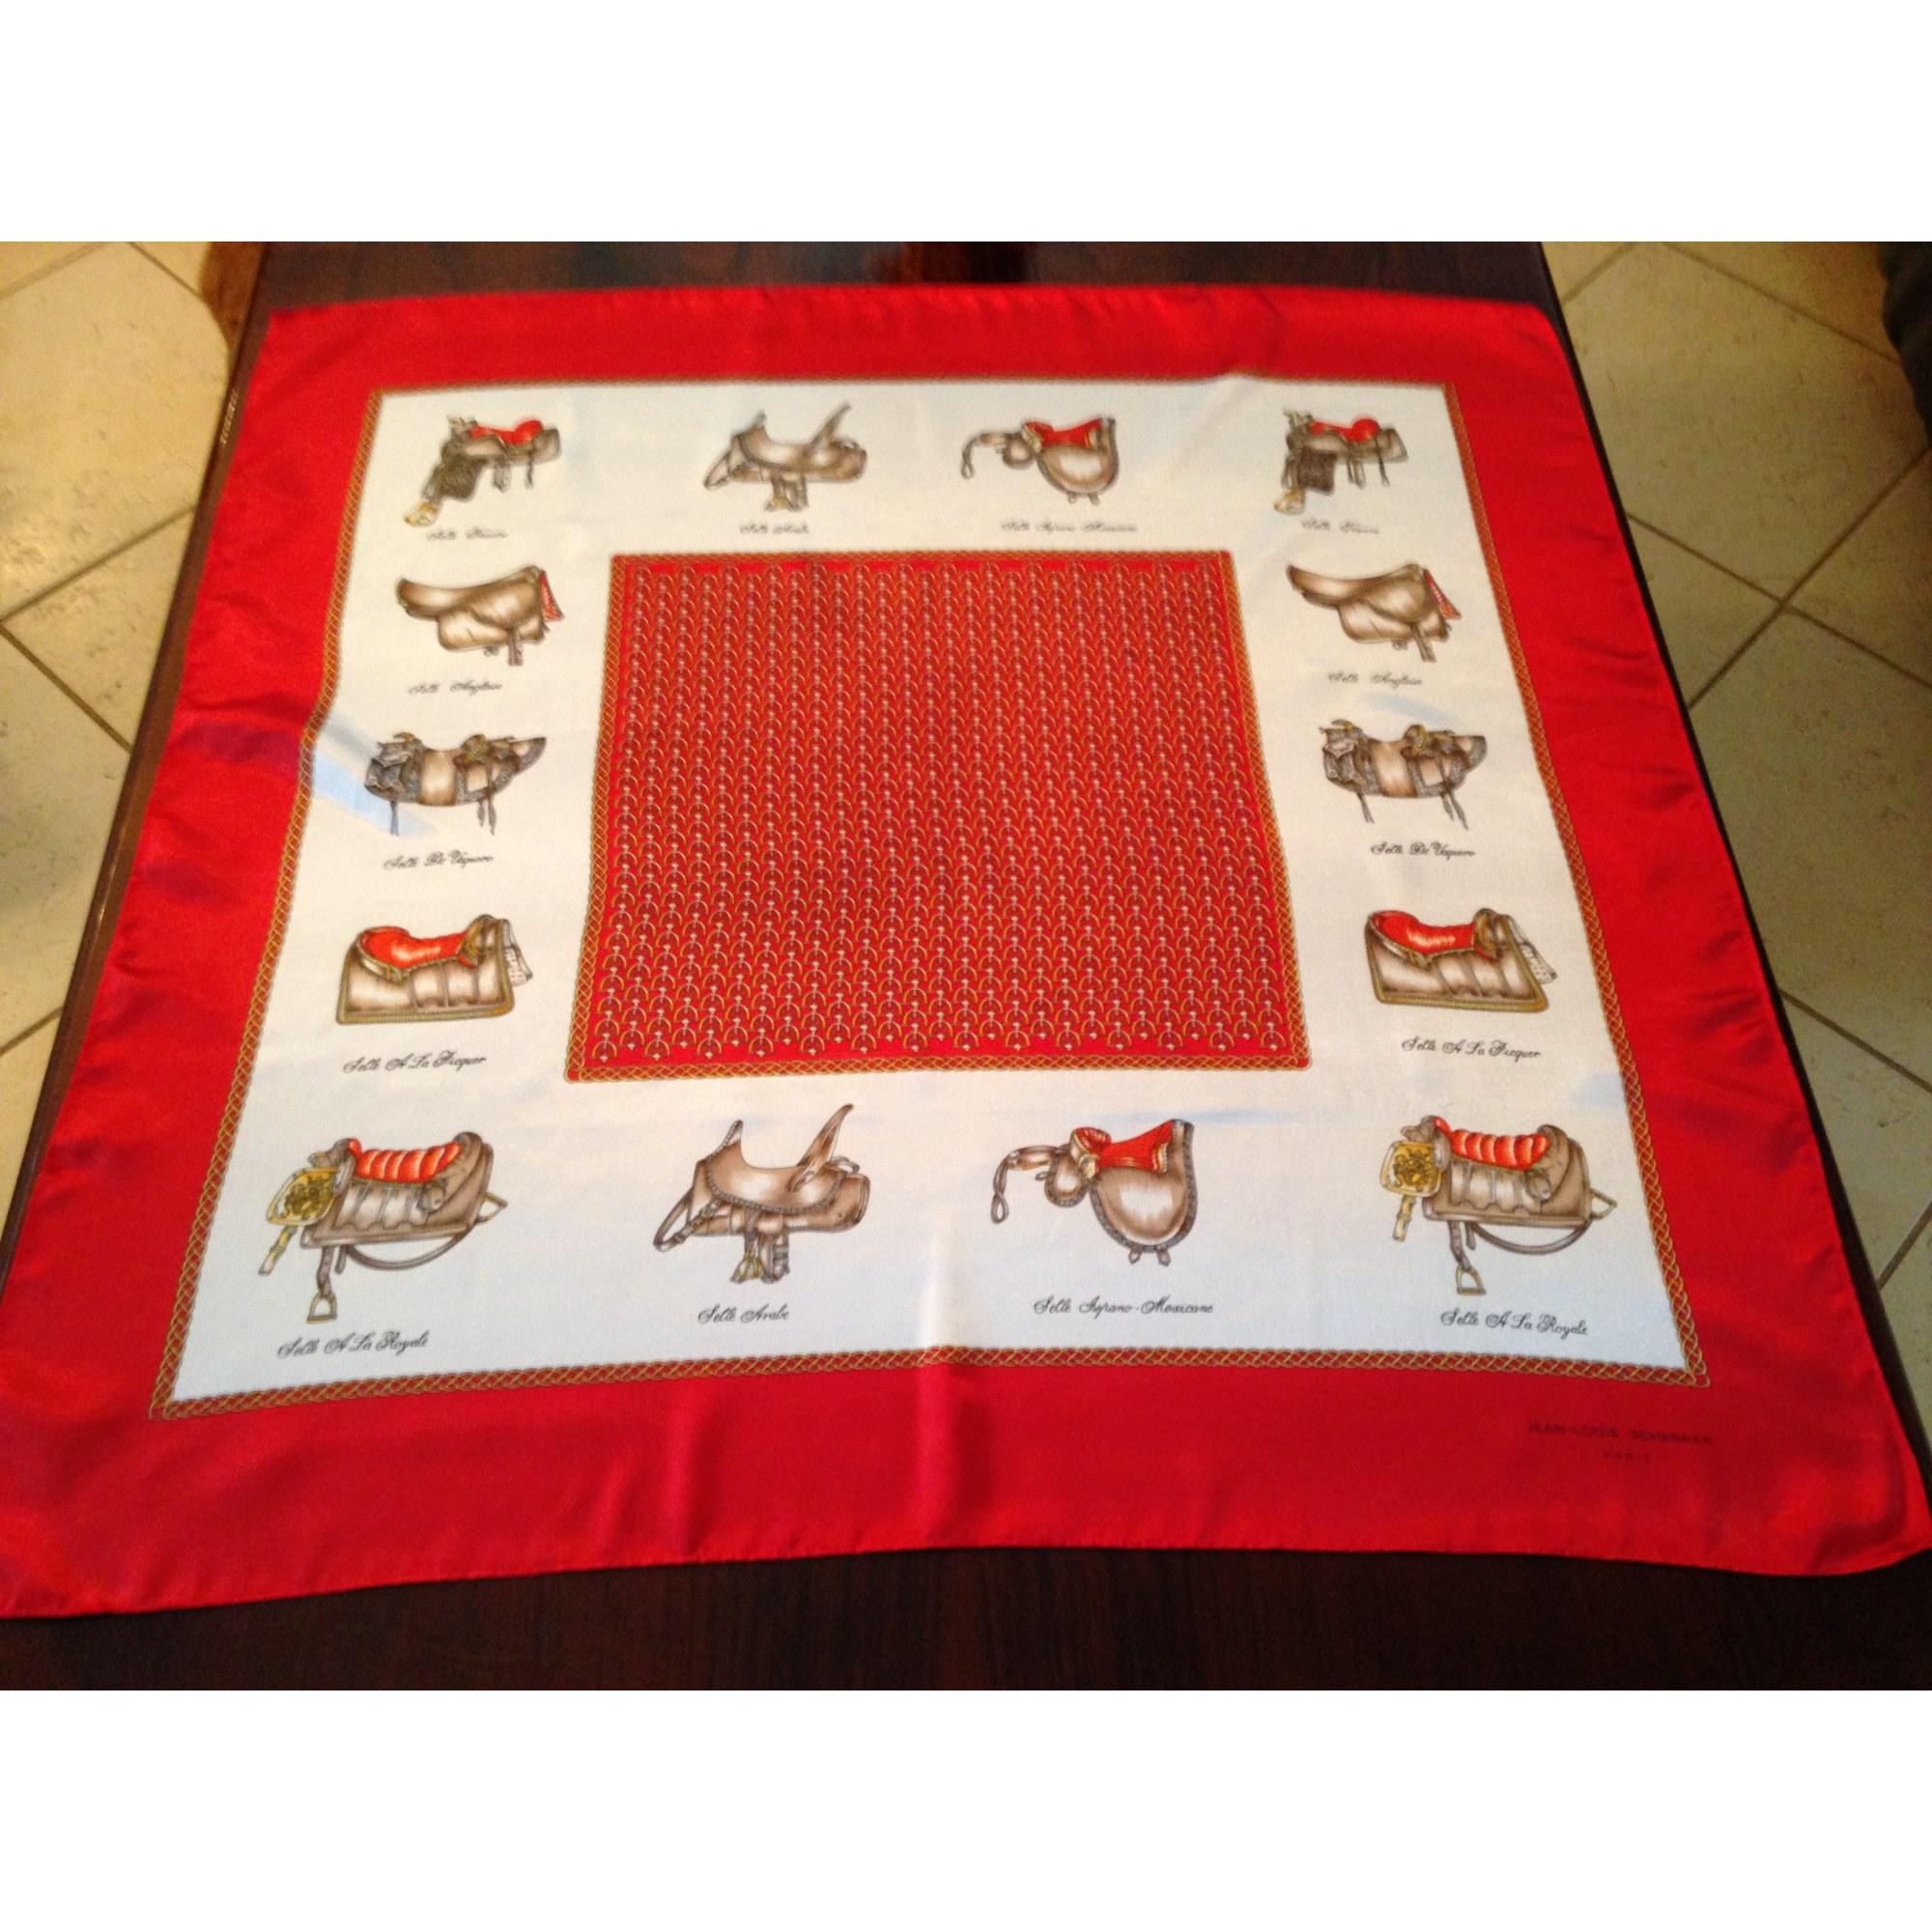 Foulard JEAN LOUIS SCHERRER rouge hermès et blanc